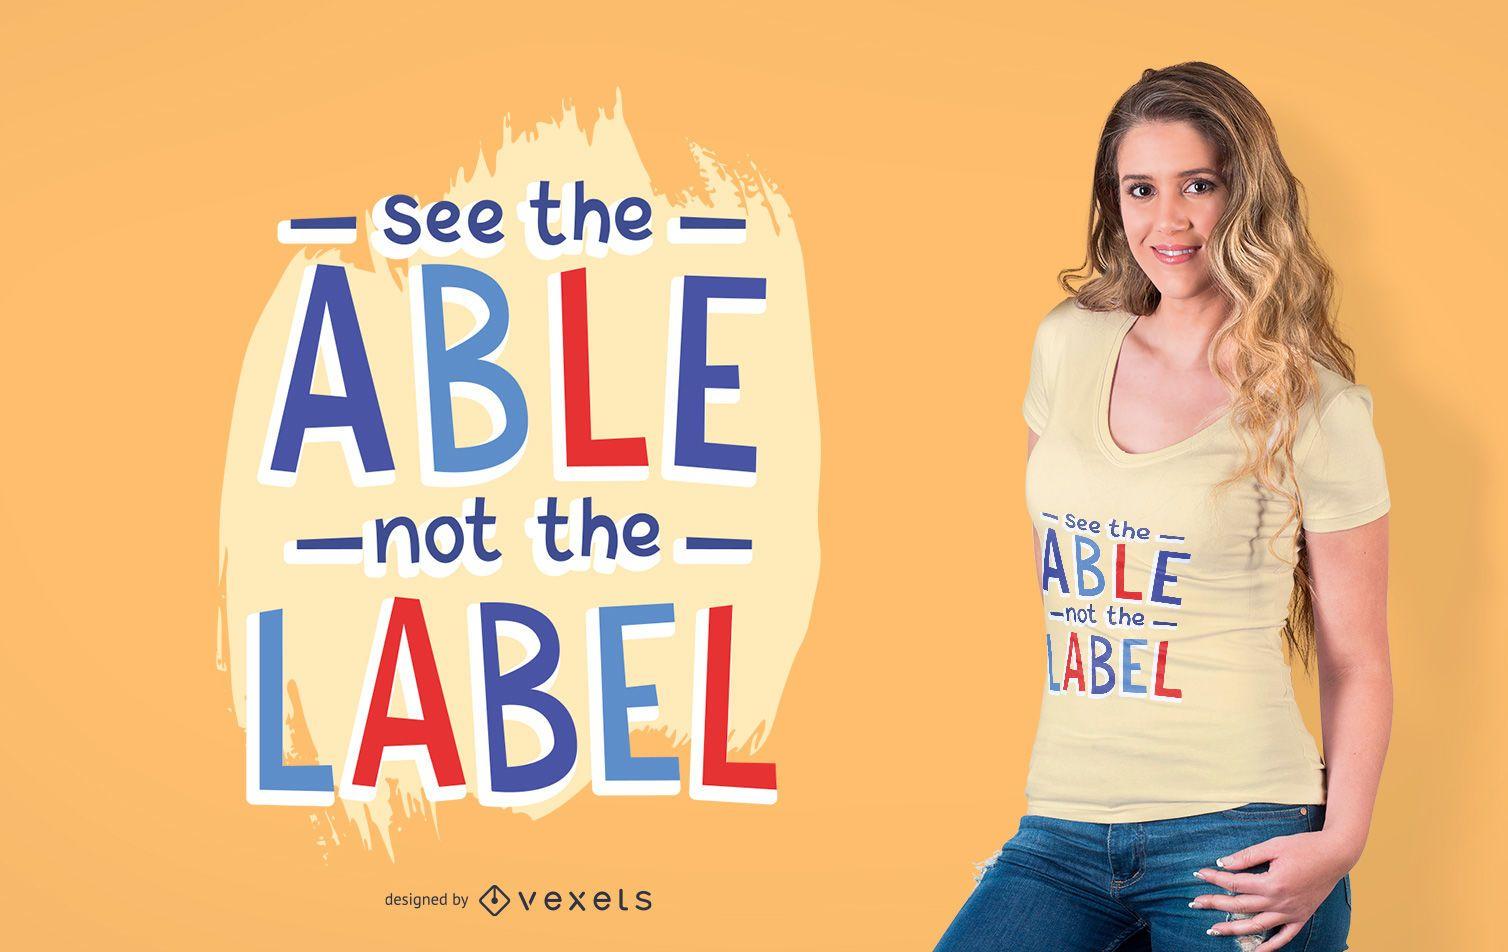 Diseño de camiseta de texto de apoyo para niños